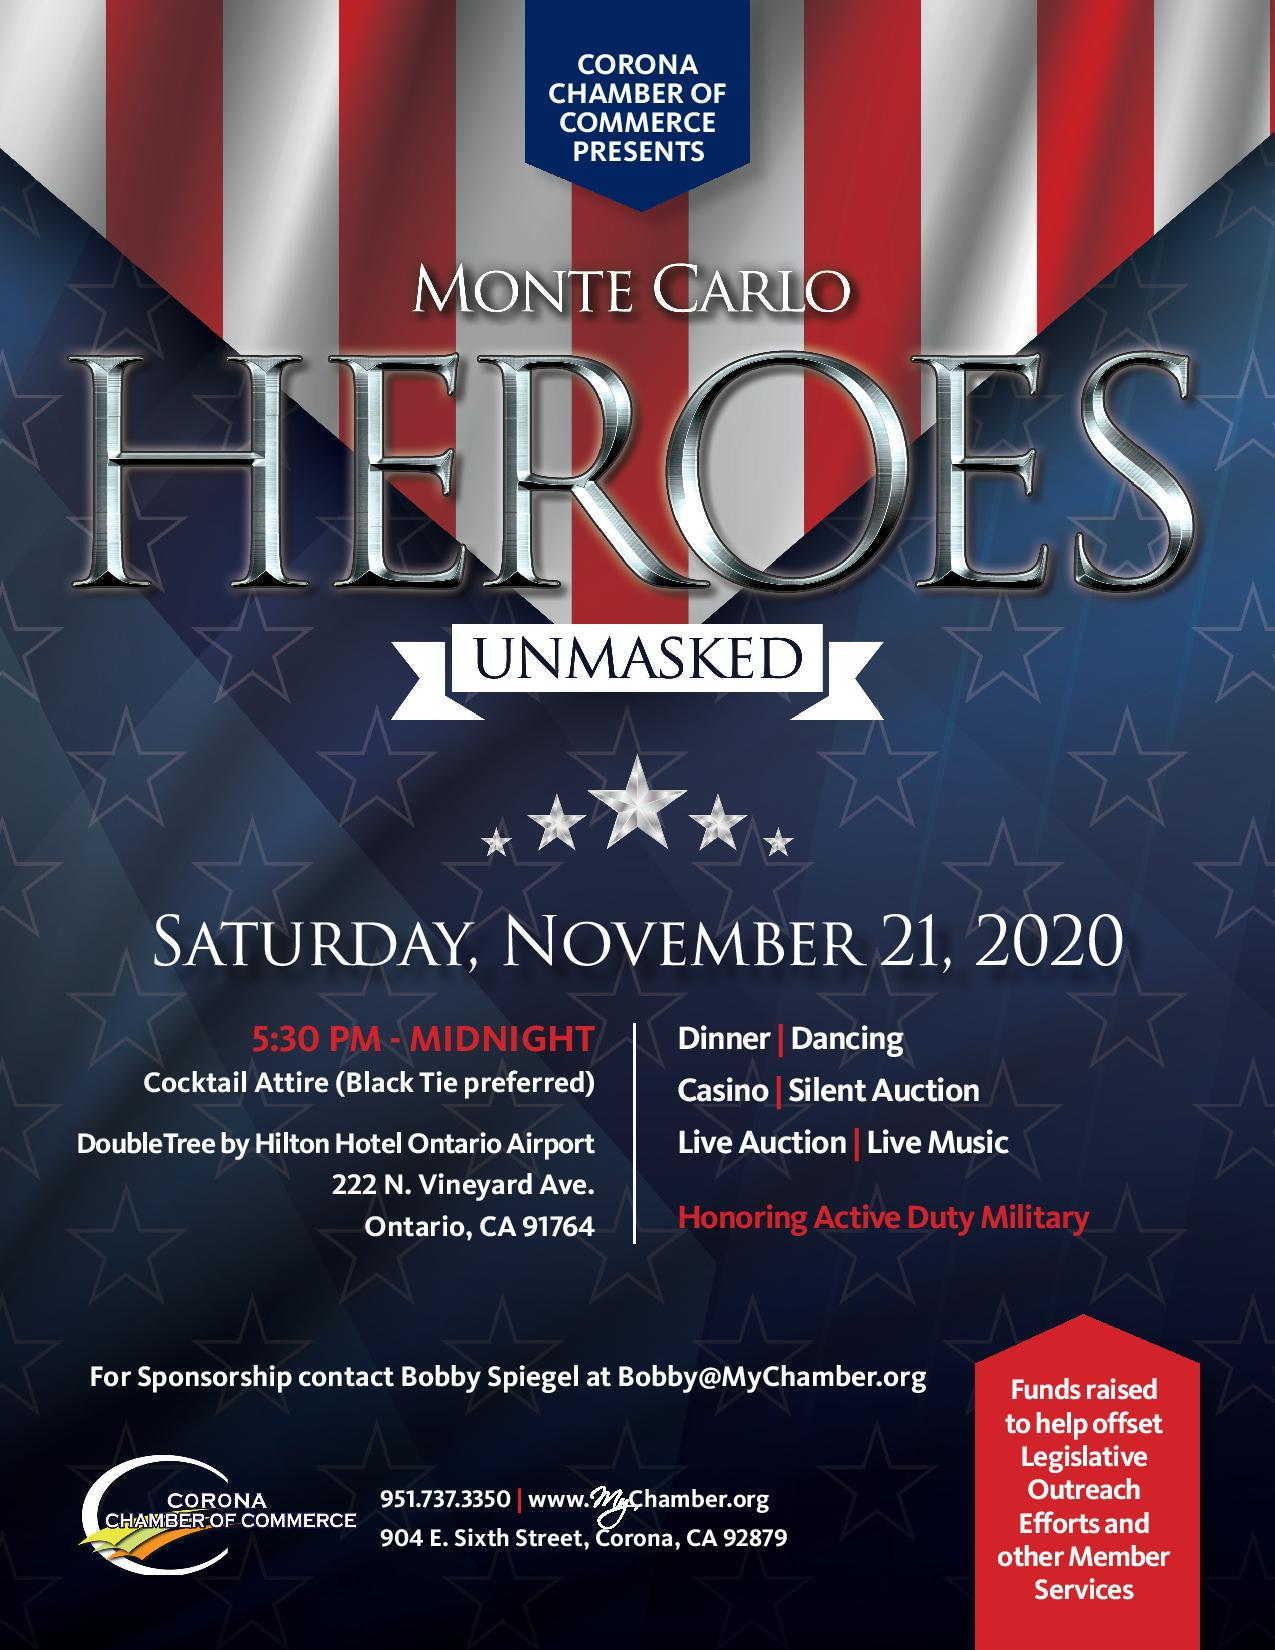 Heroes Unmasked Flyer